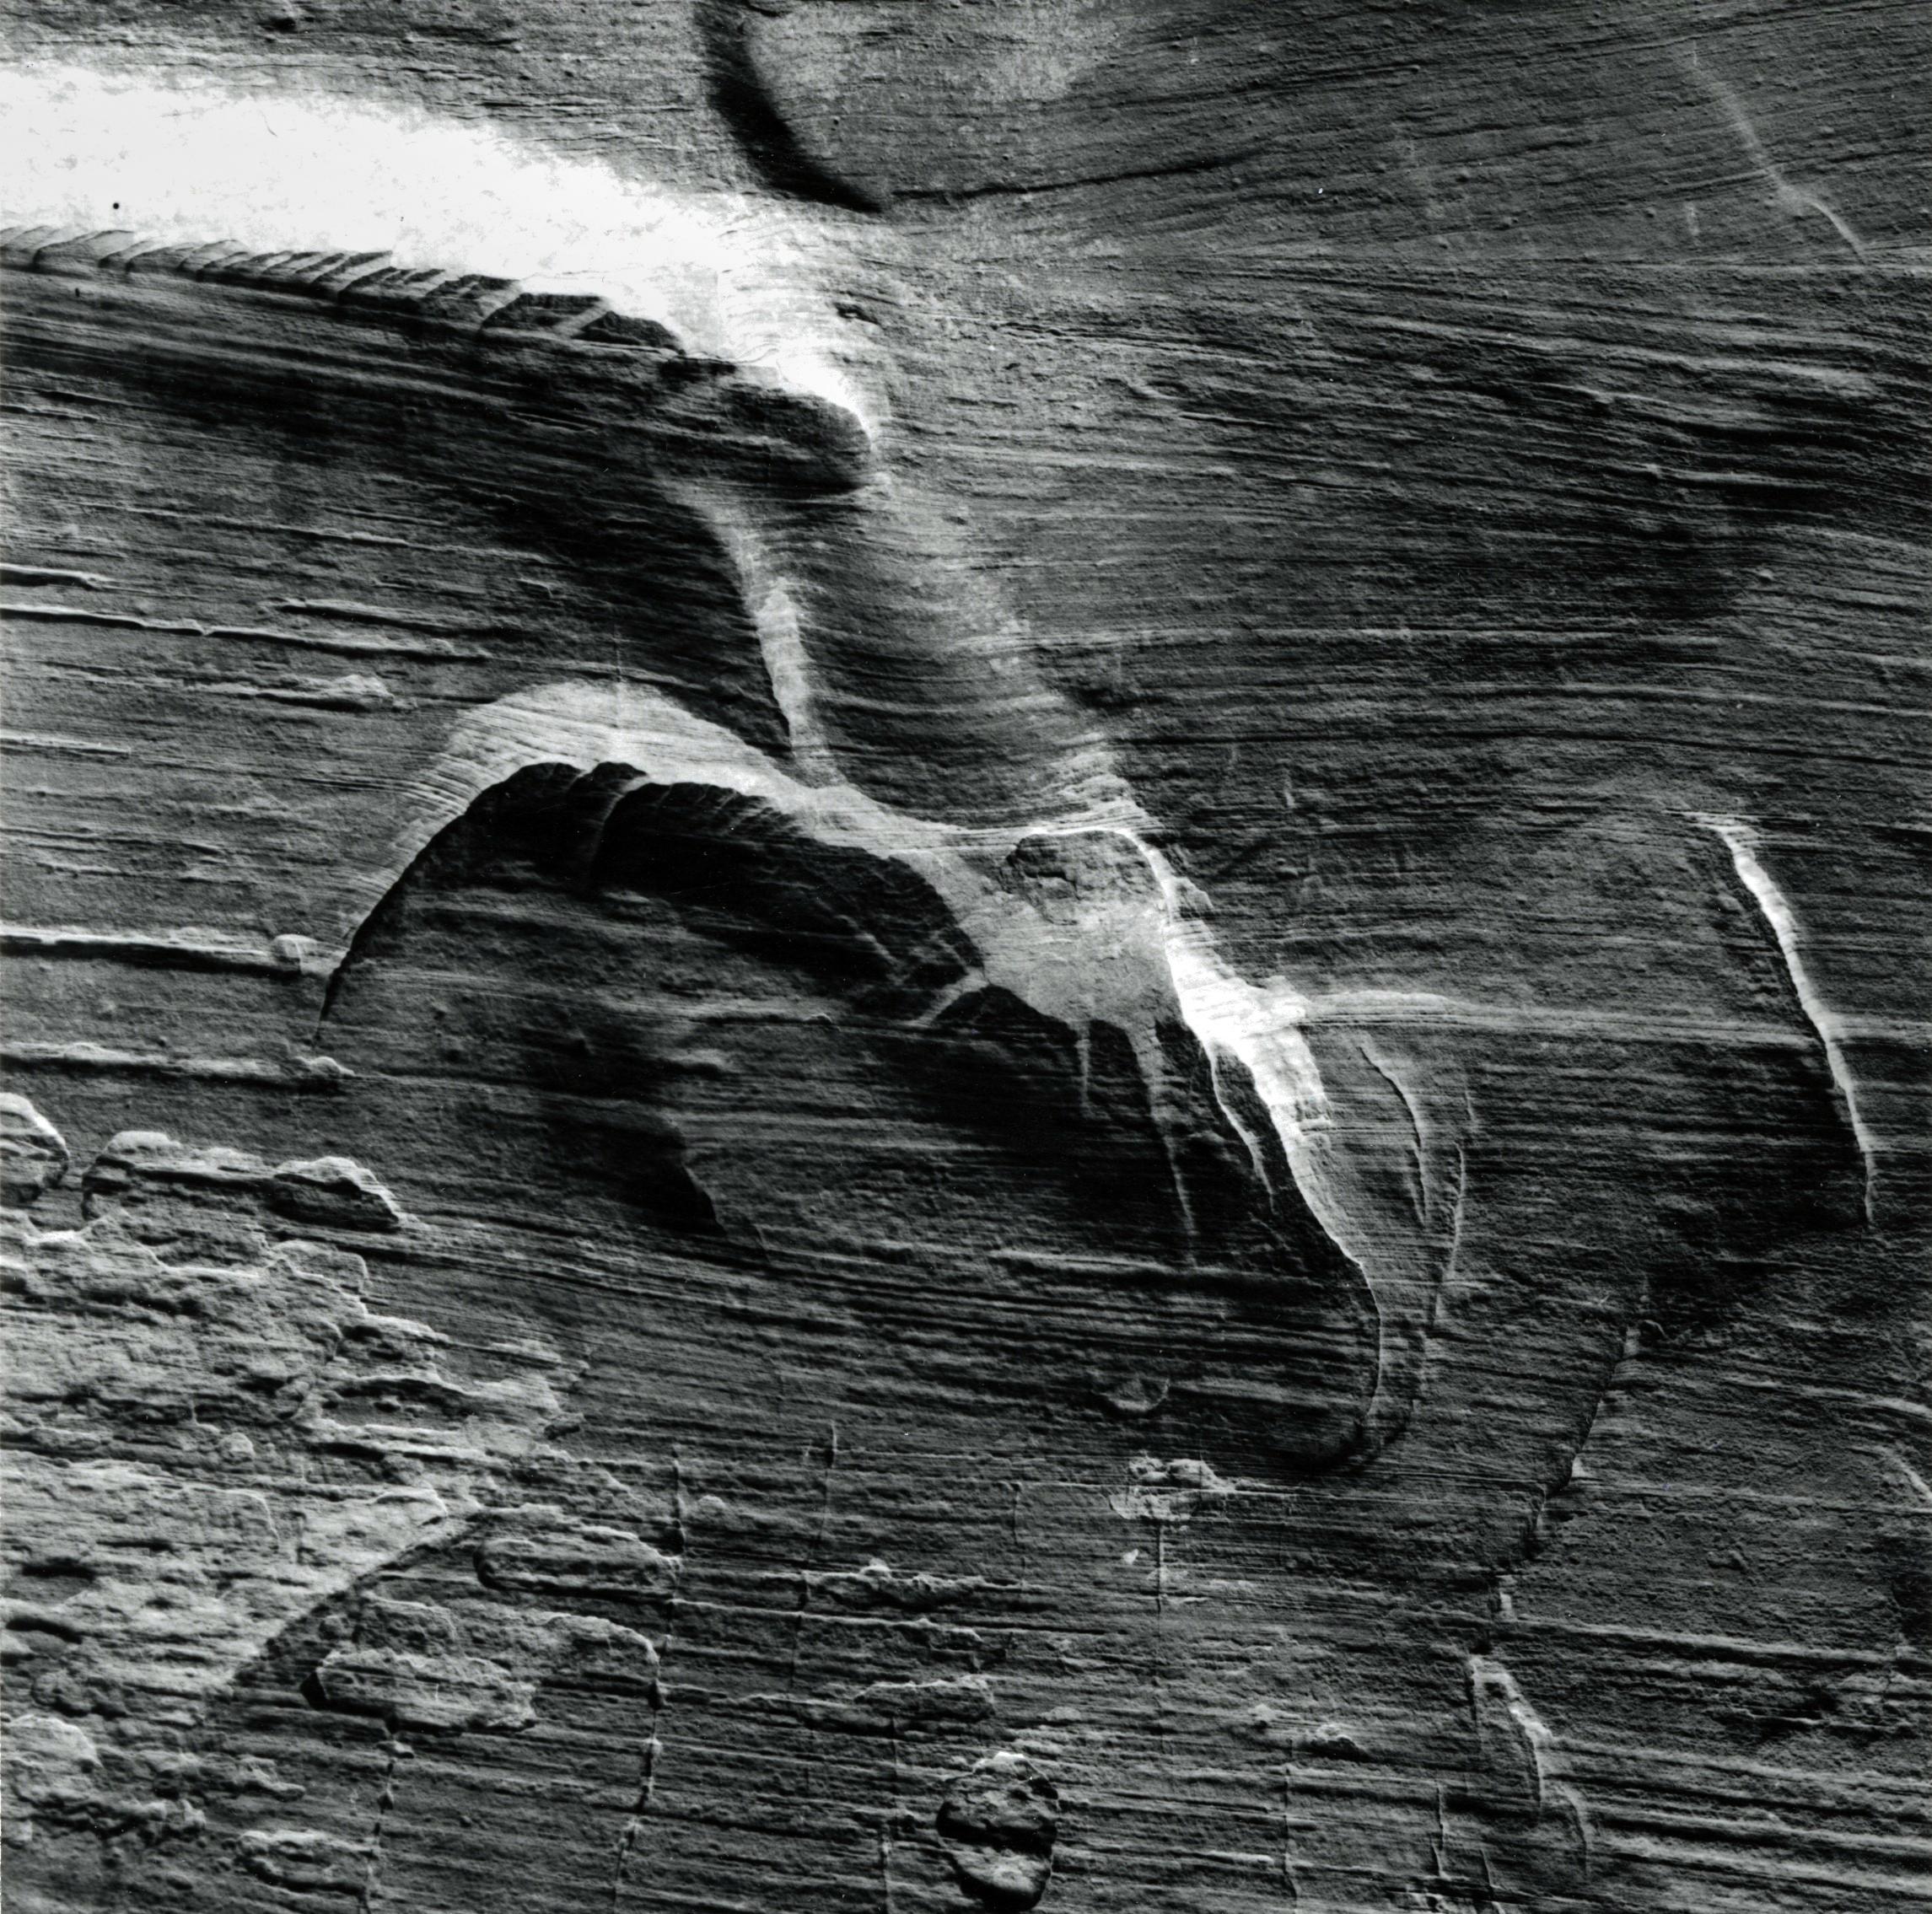 Wall Form, Zion, Utah